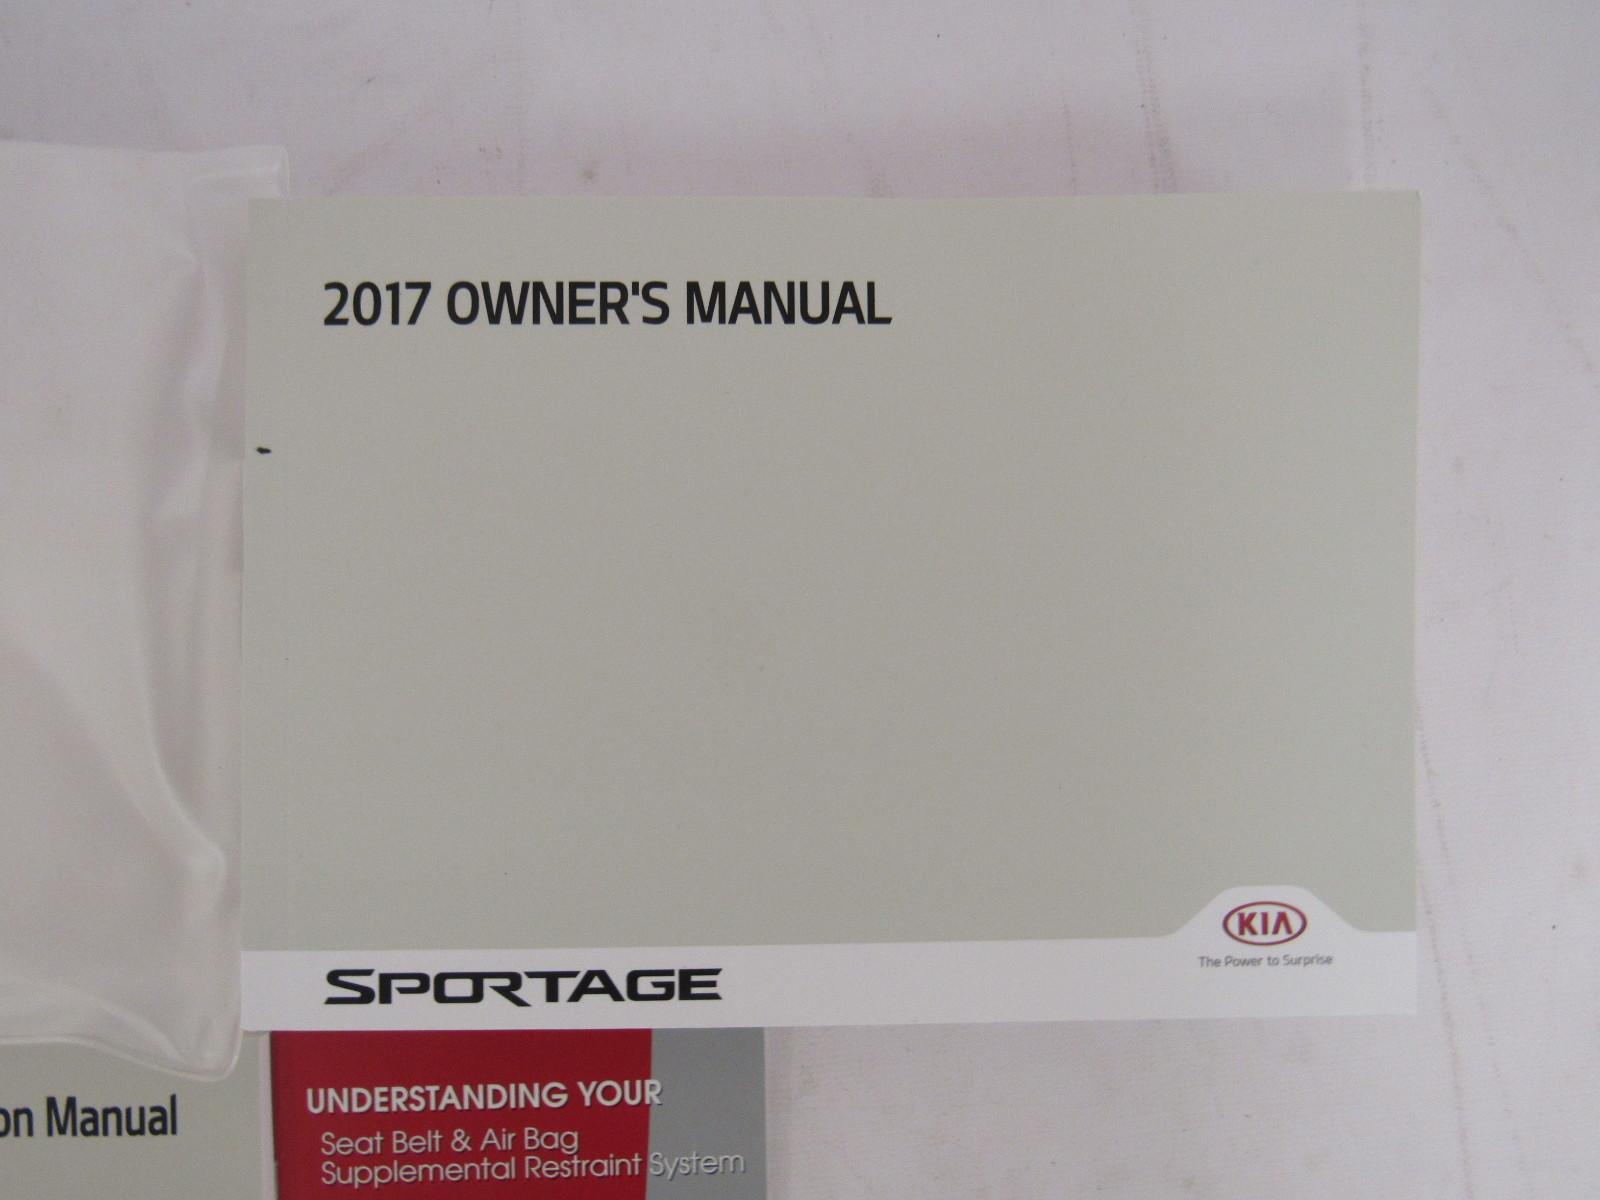 2017 kia sportage owners manual book bashful yak rh bashfulyak com kia sportage owners manual 2015 kia sportage owners manual 2012